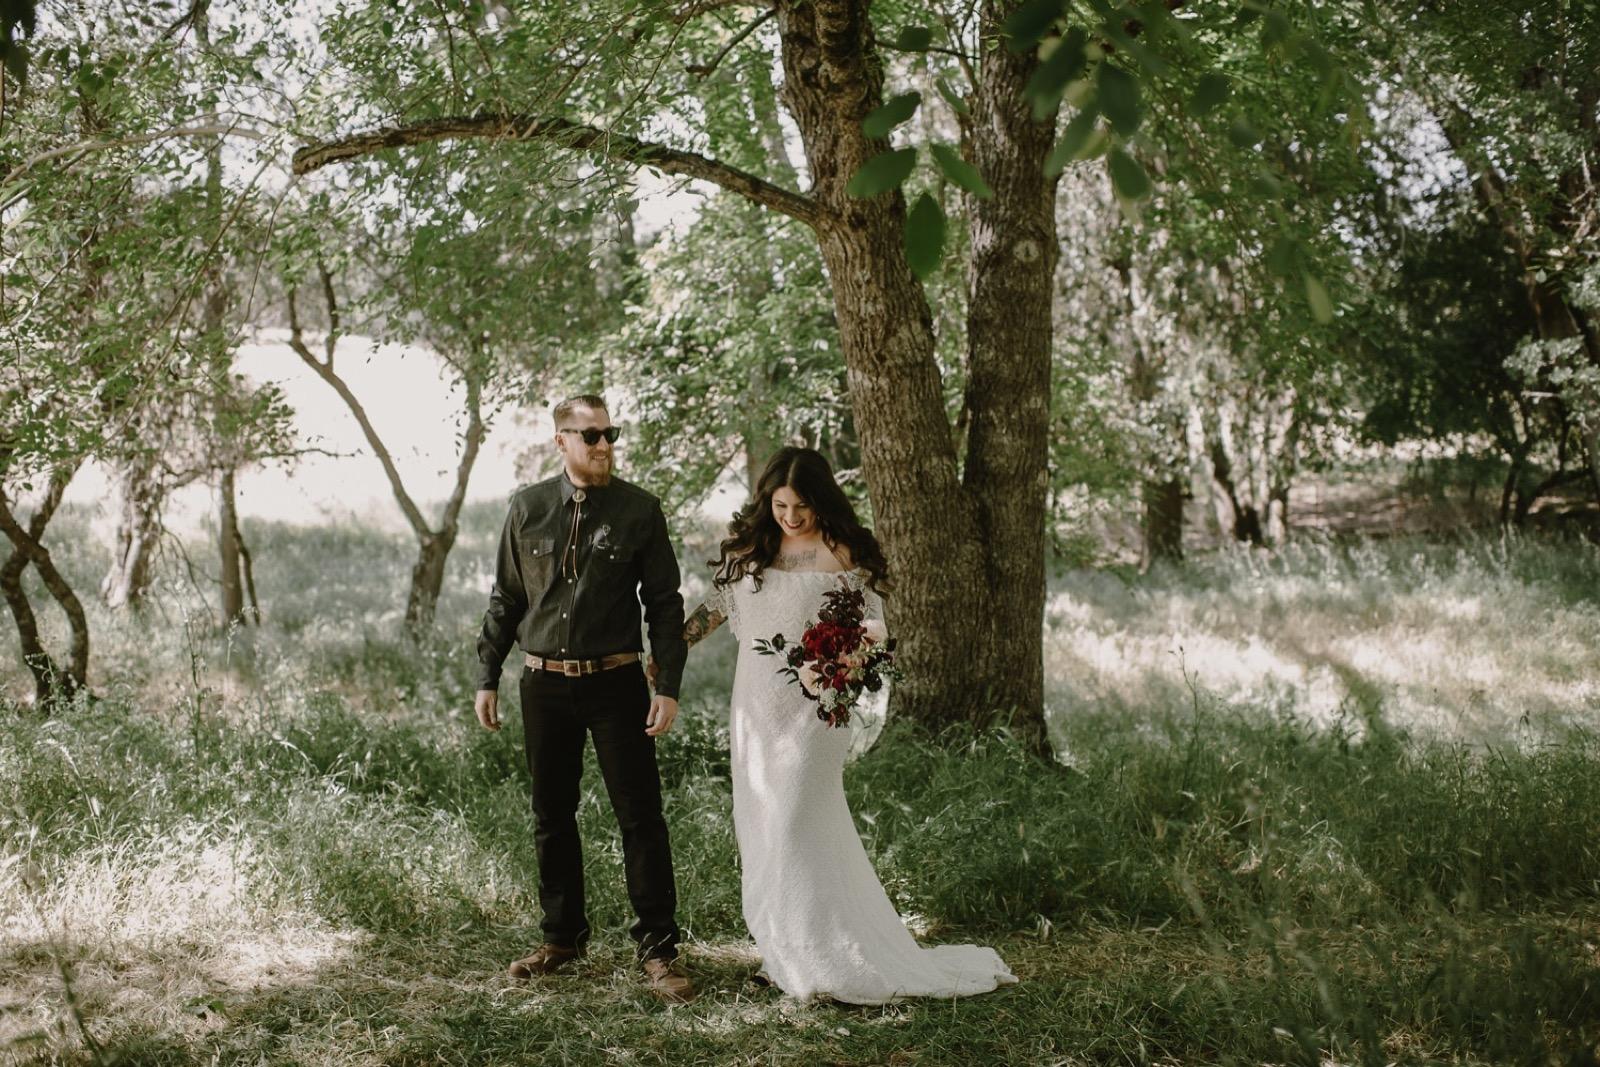 045_California_Ranch_Wedding104.jpg